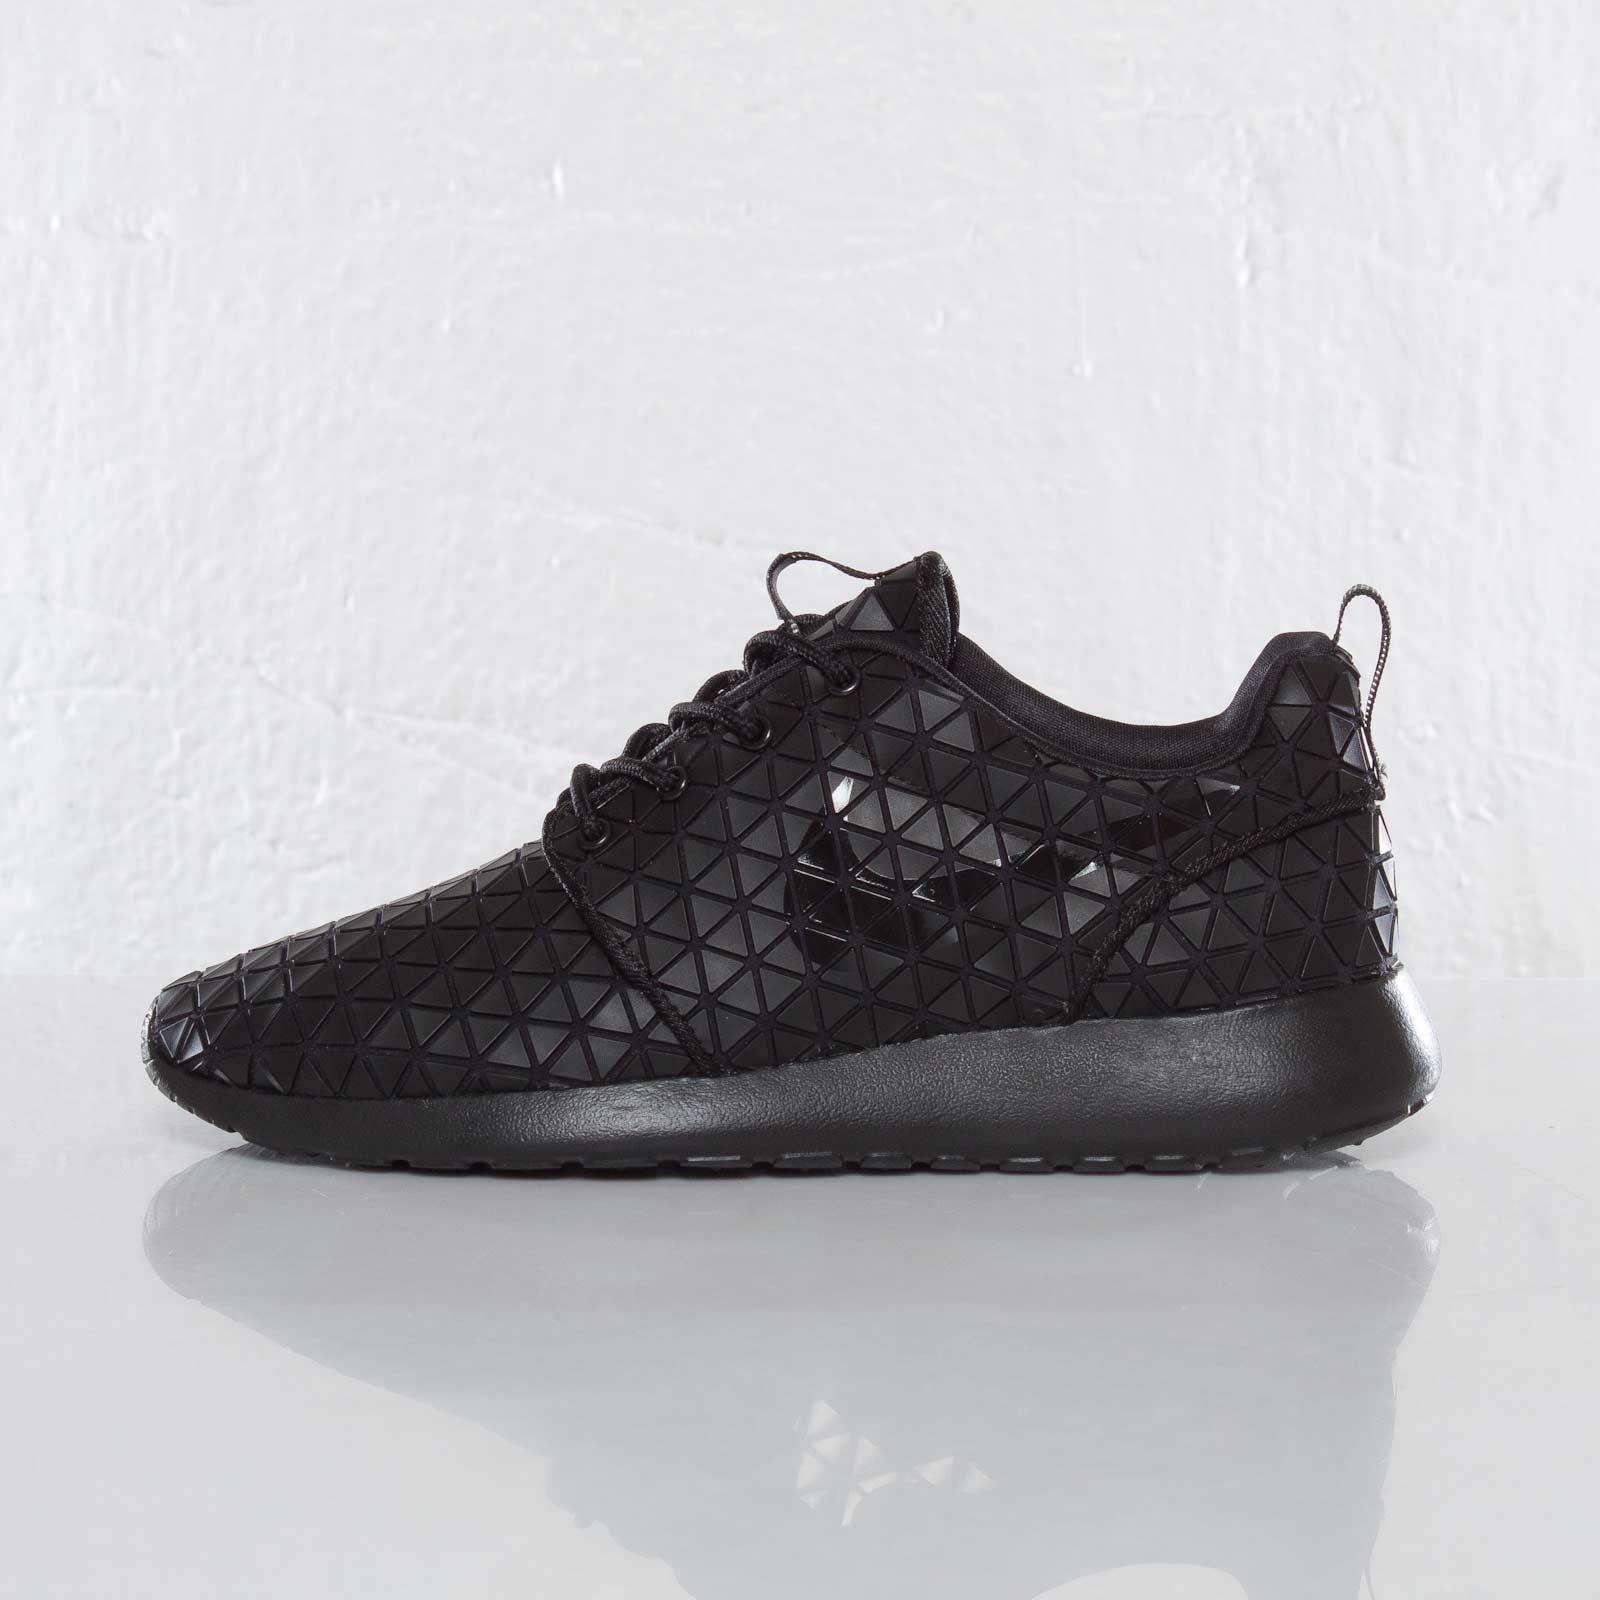 d5af55e70aff7 Nike Wmns Roshe Run Metric QS - 607284-001 - Sneakersnstuff ...